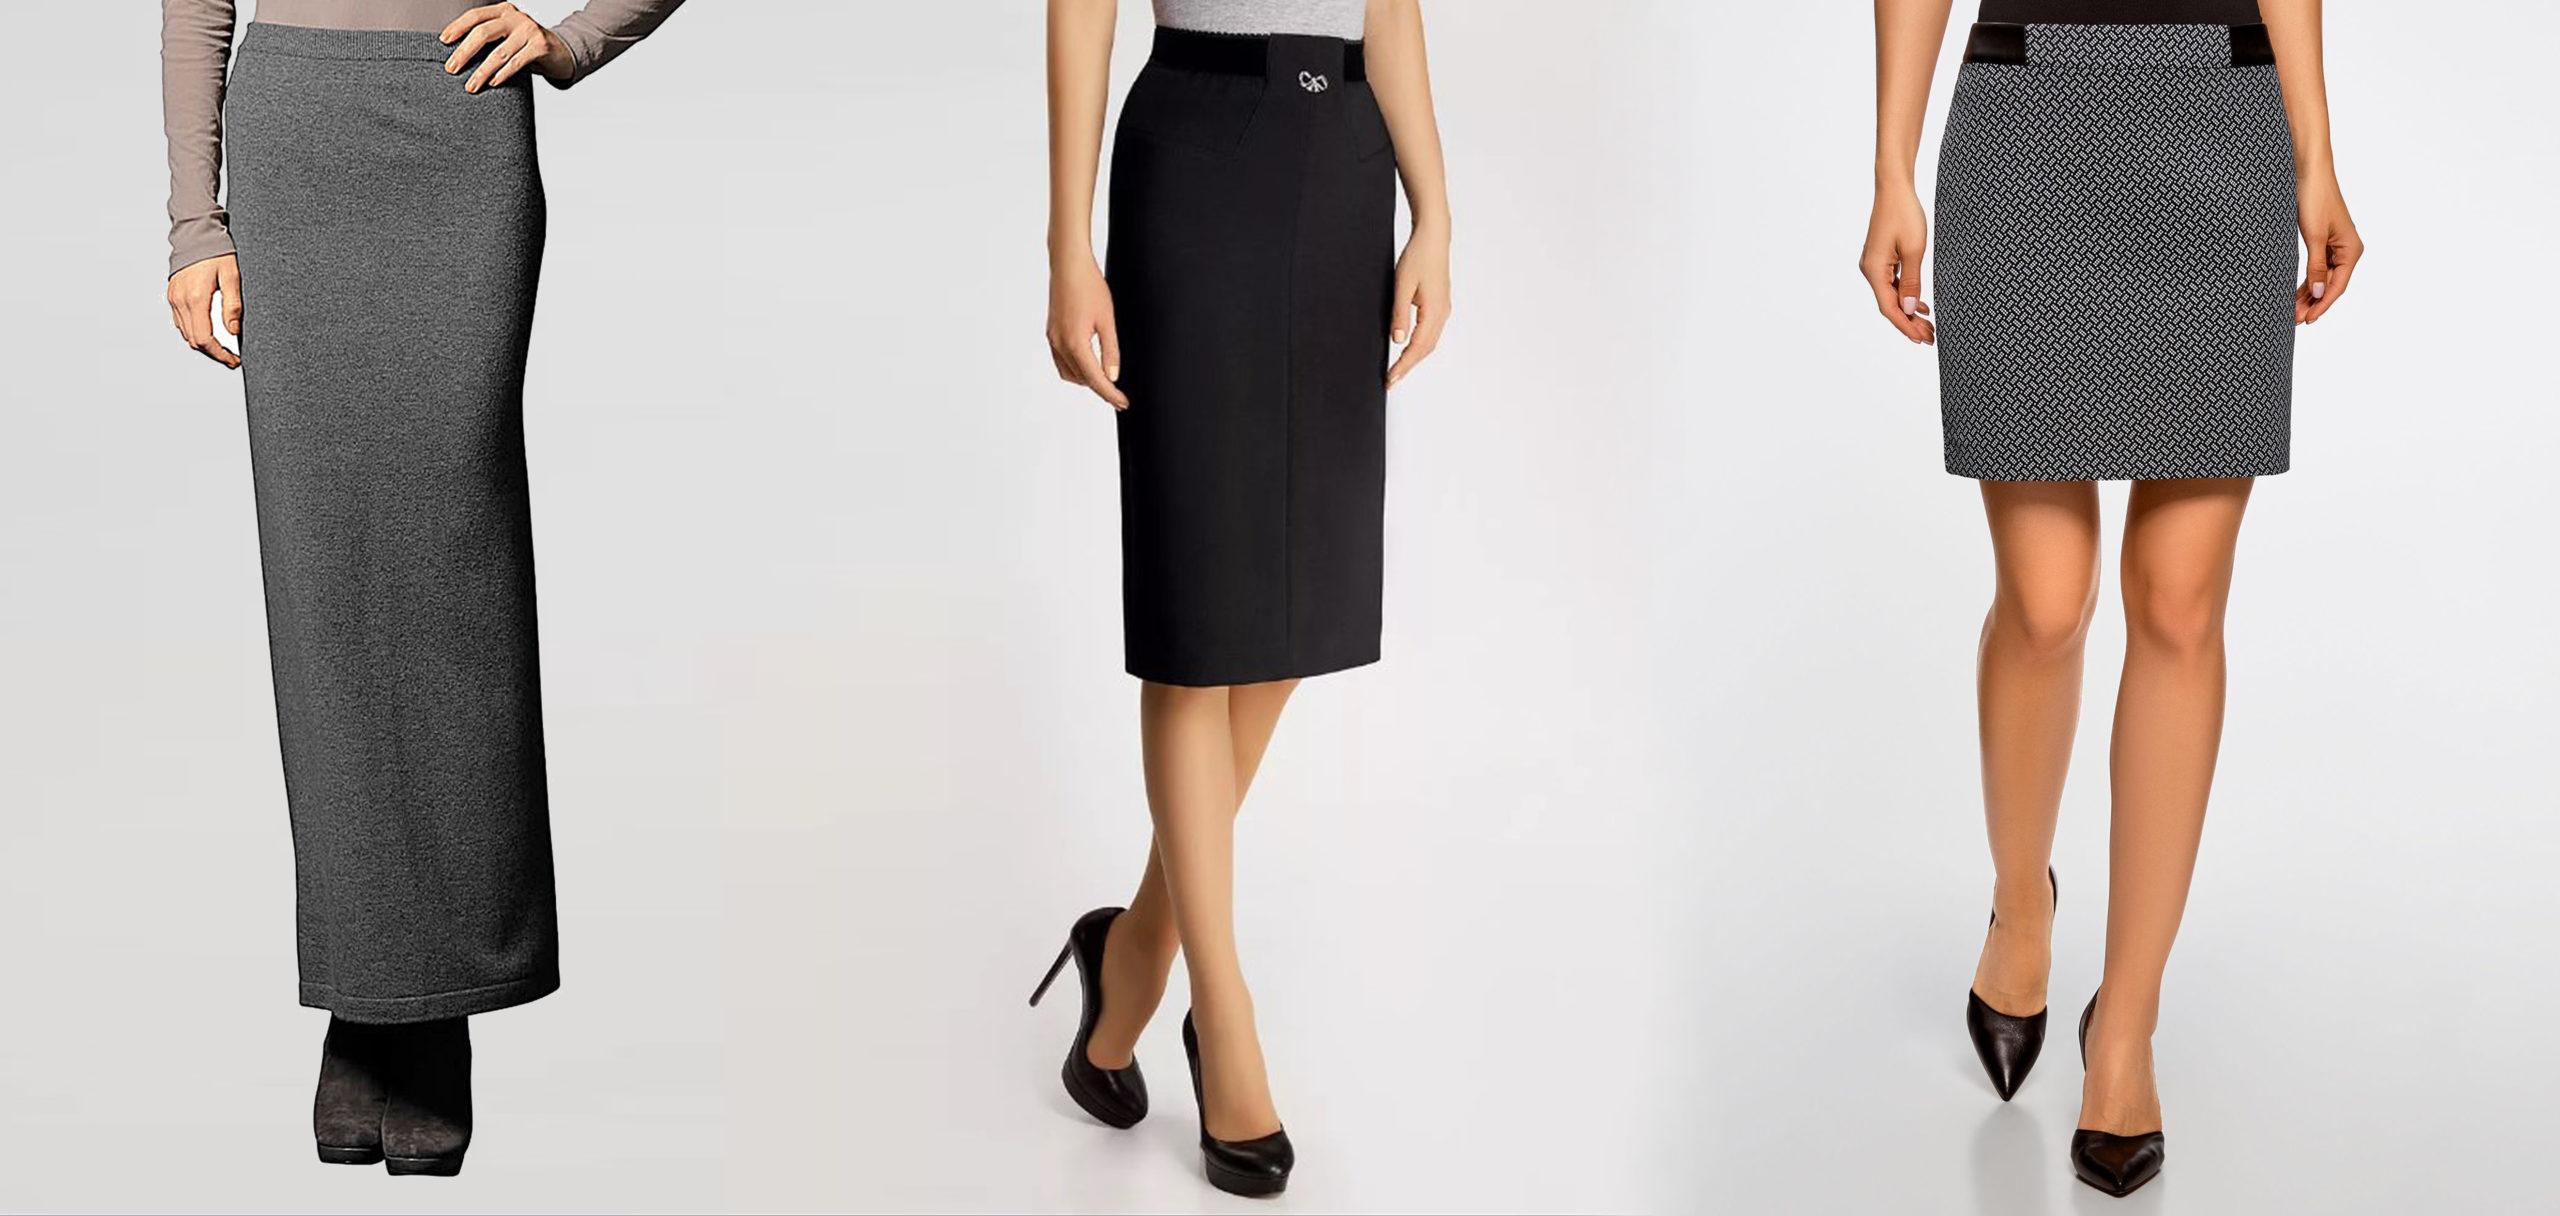 длина прямой юбки на заказ